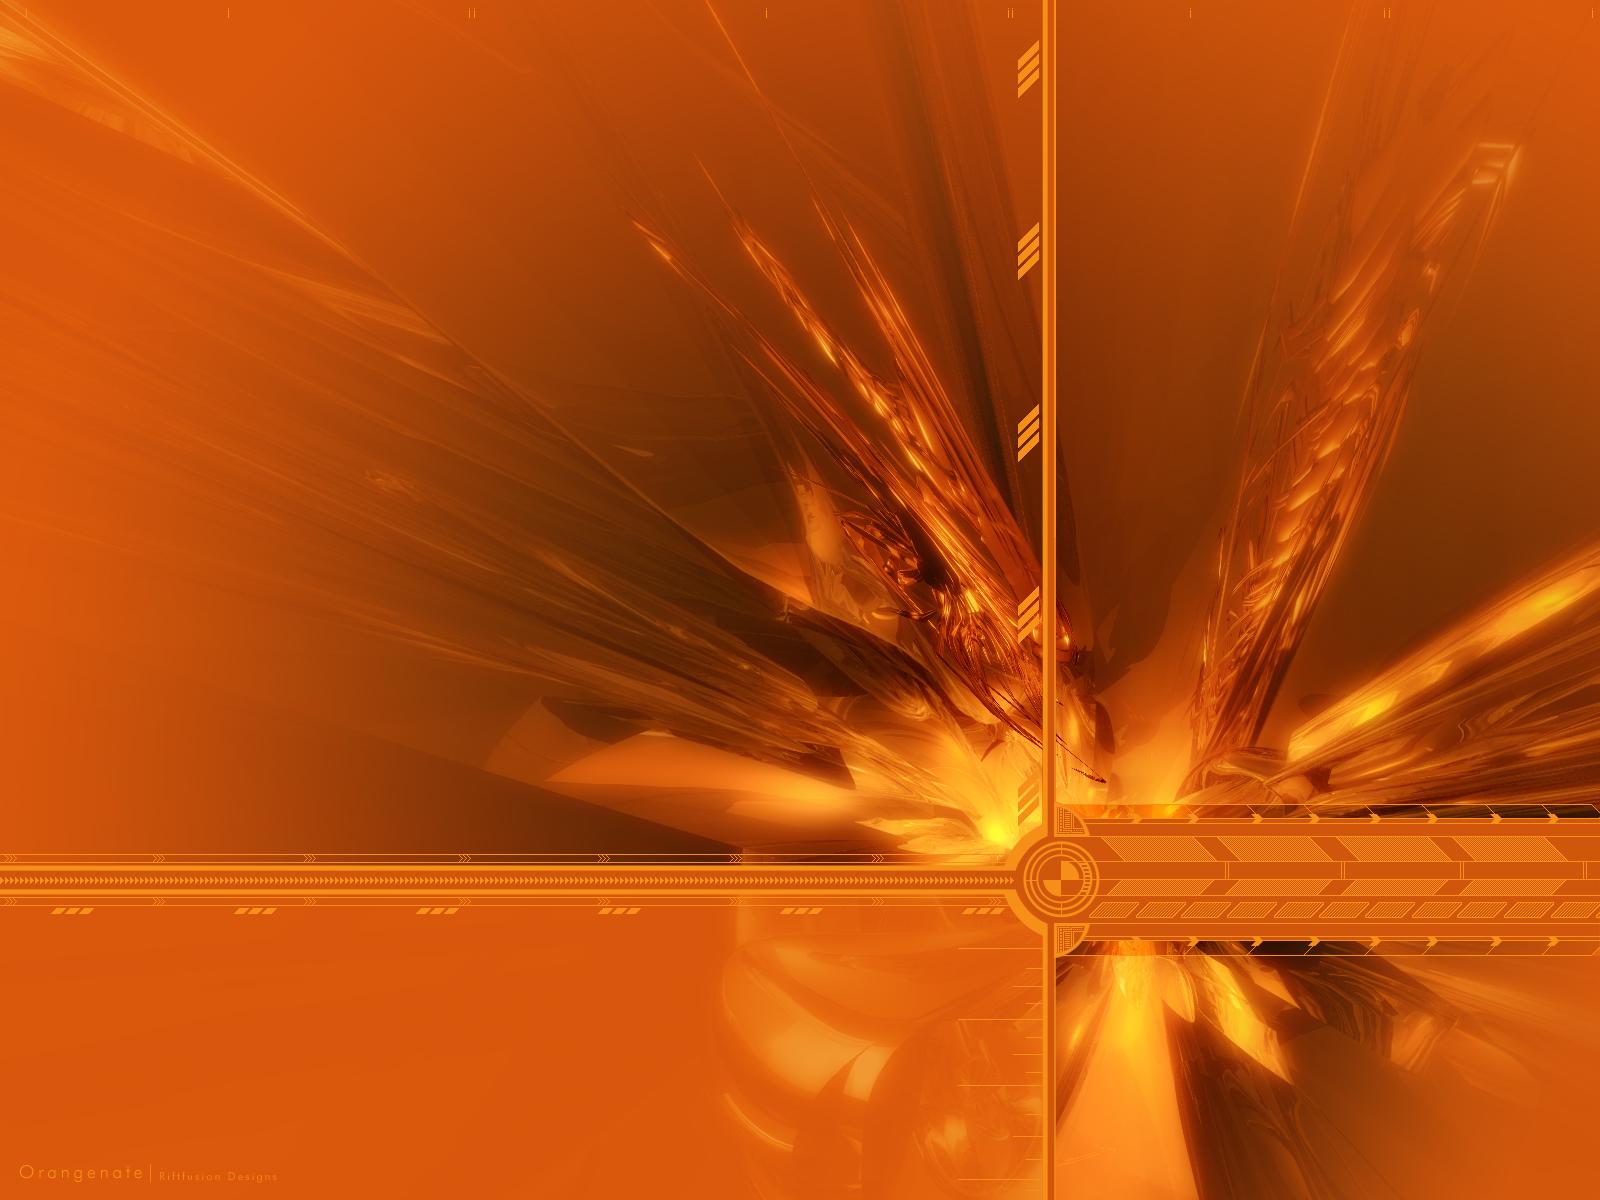 Abstract Orange Wallpaper 1600x1200 Abstract Orange 1600x1200